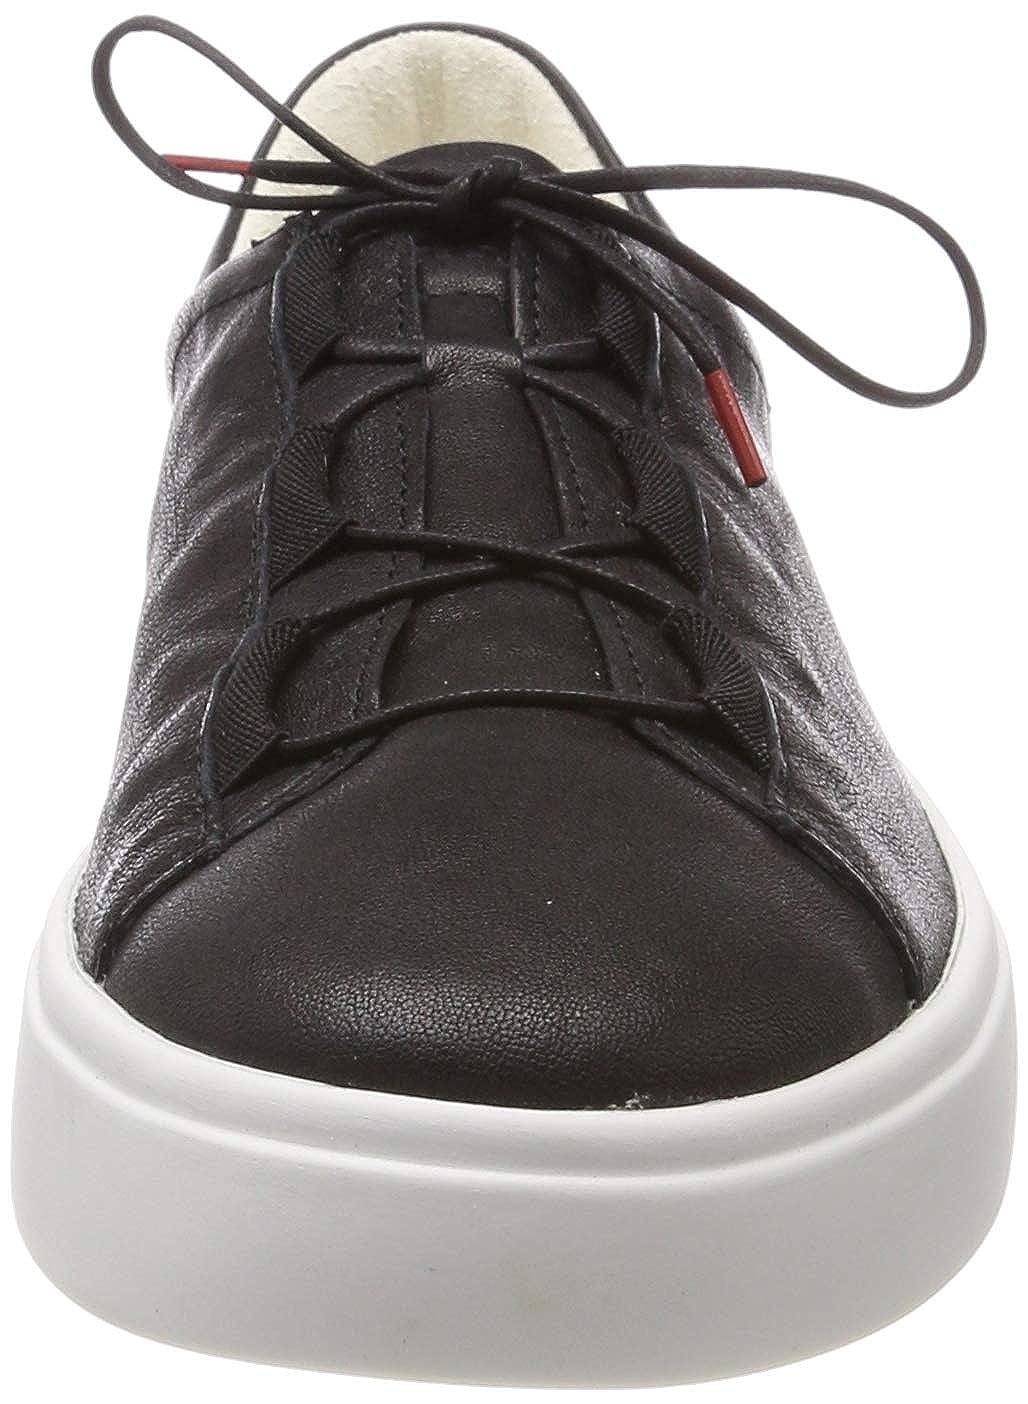 Sz//Kombi 09 Think Womens Gring/_484092 Low-Top Sneakers, 8 UK